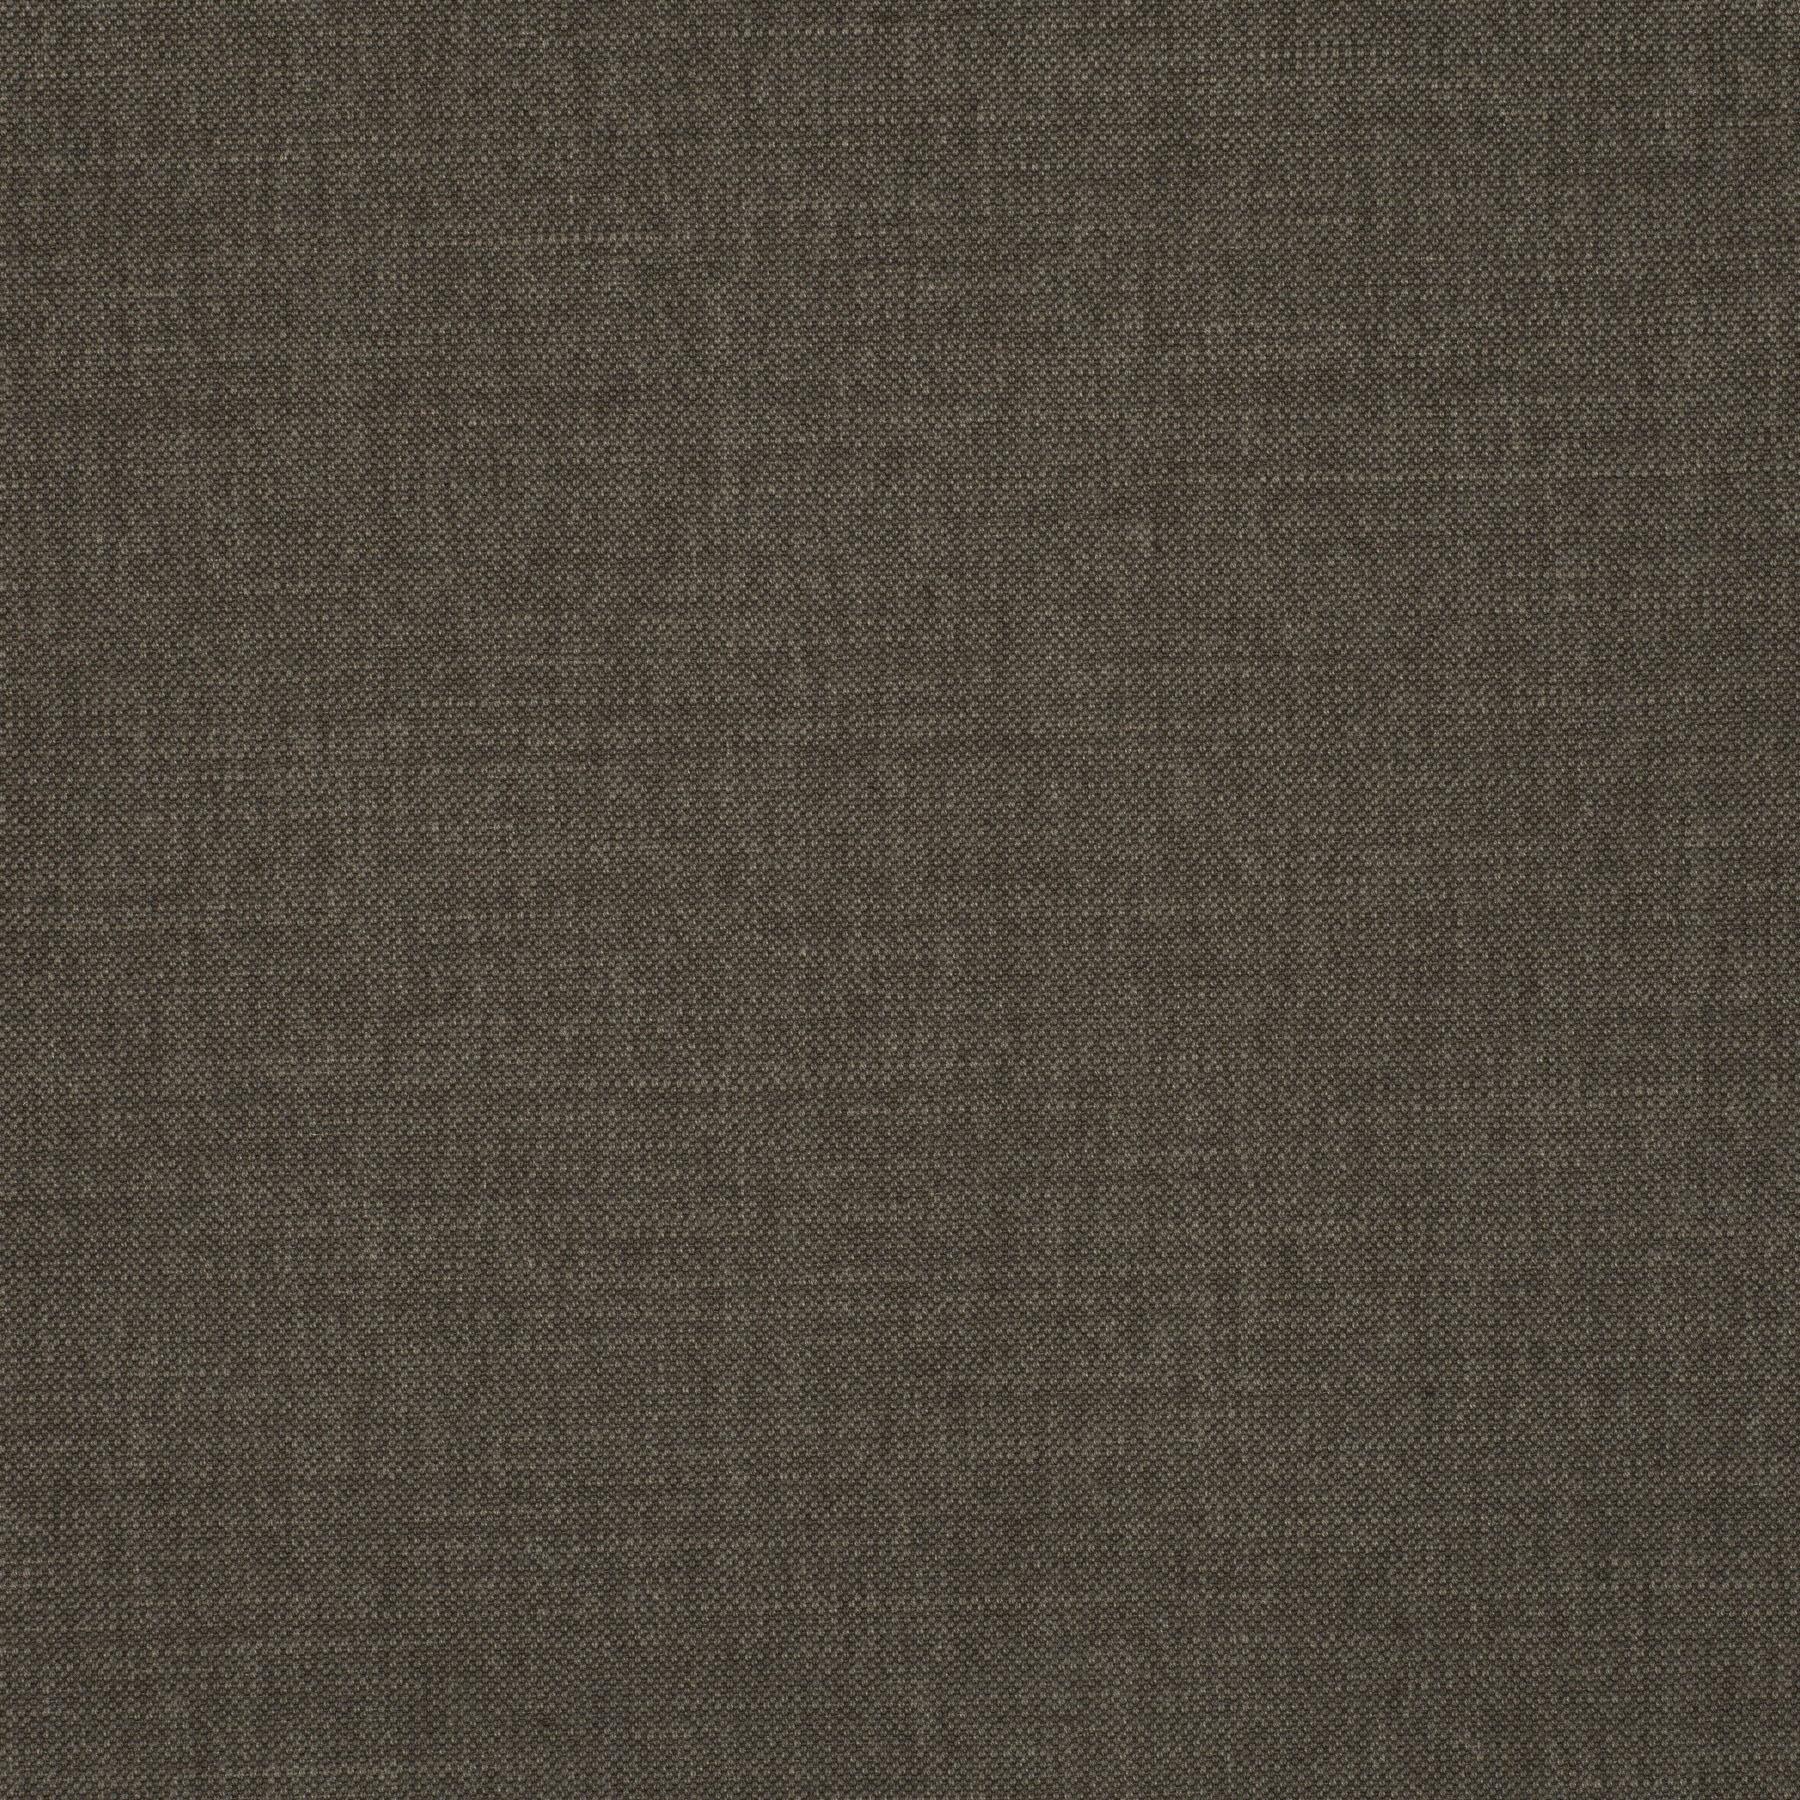 koks grå hot madison CH1249/092-0